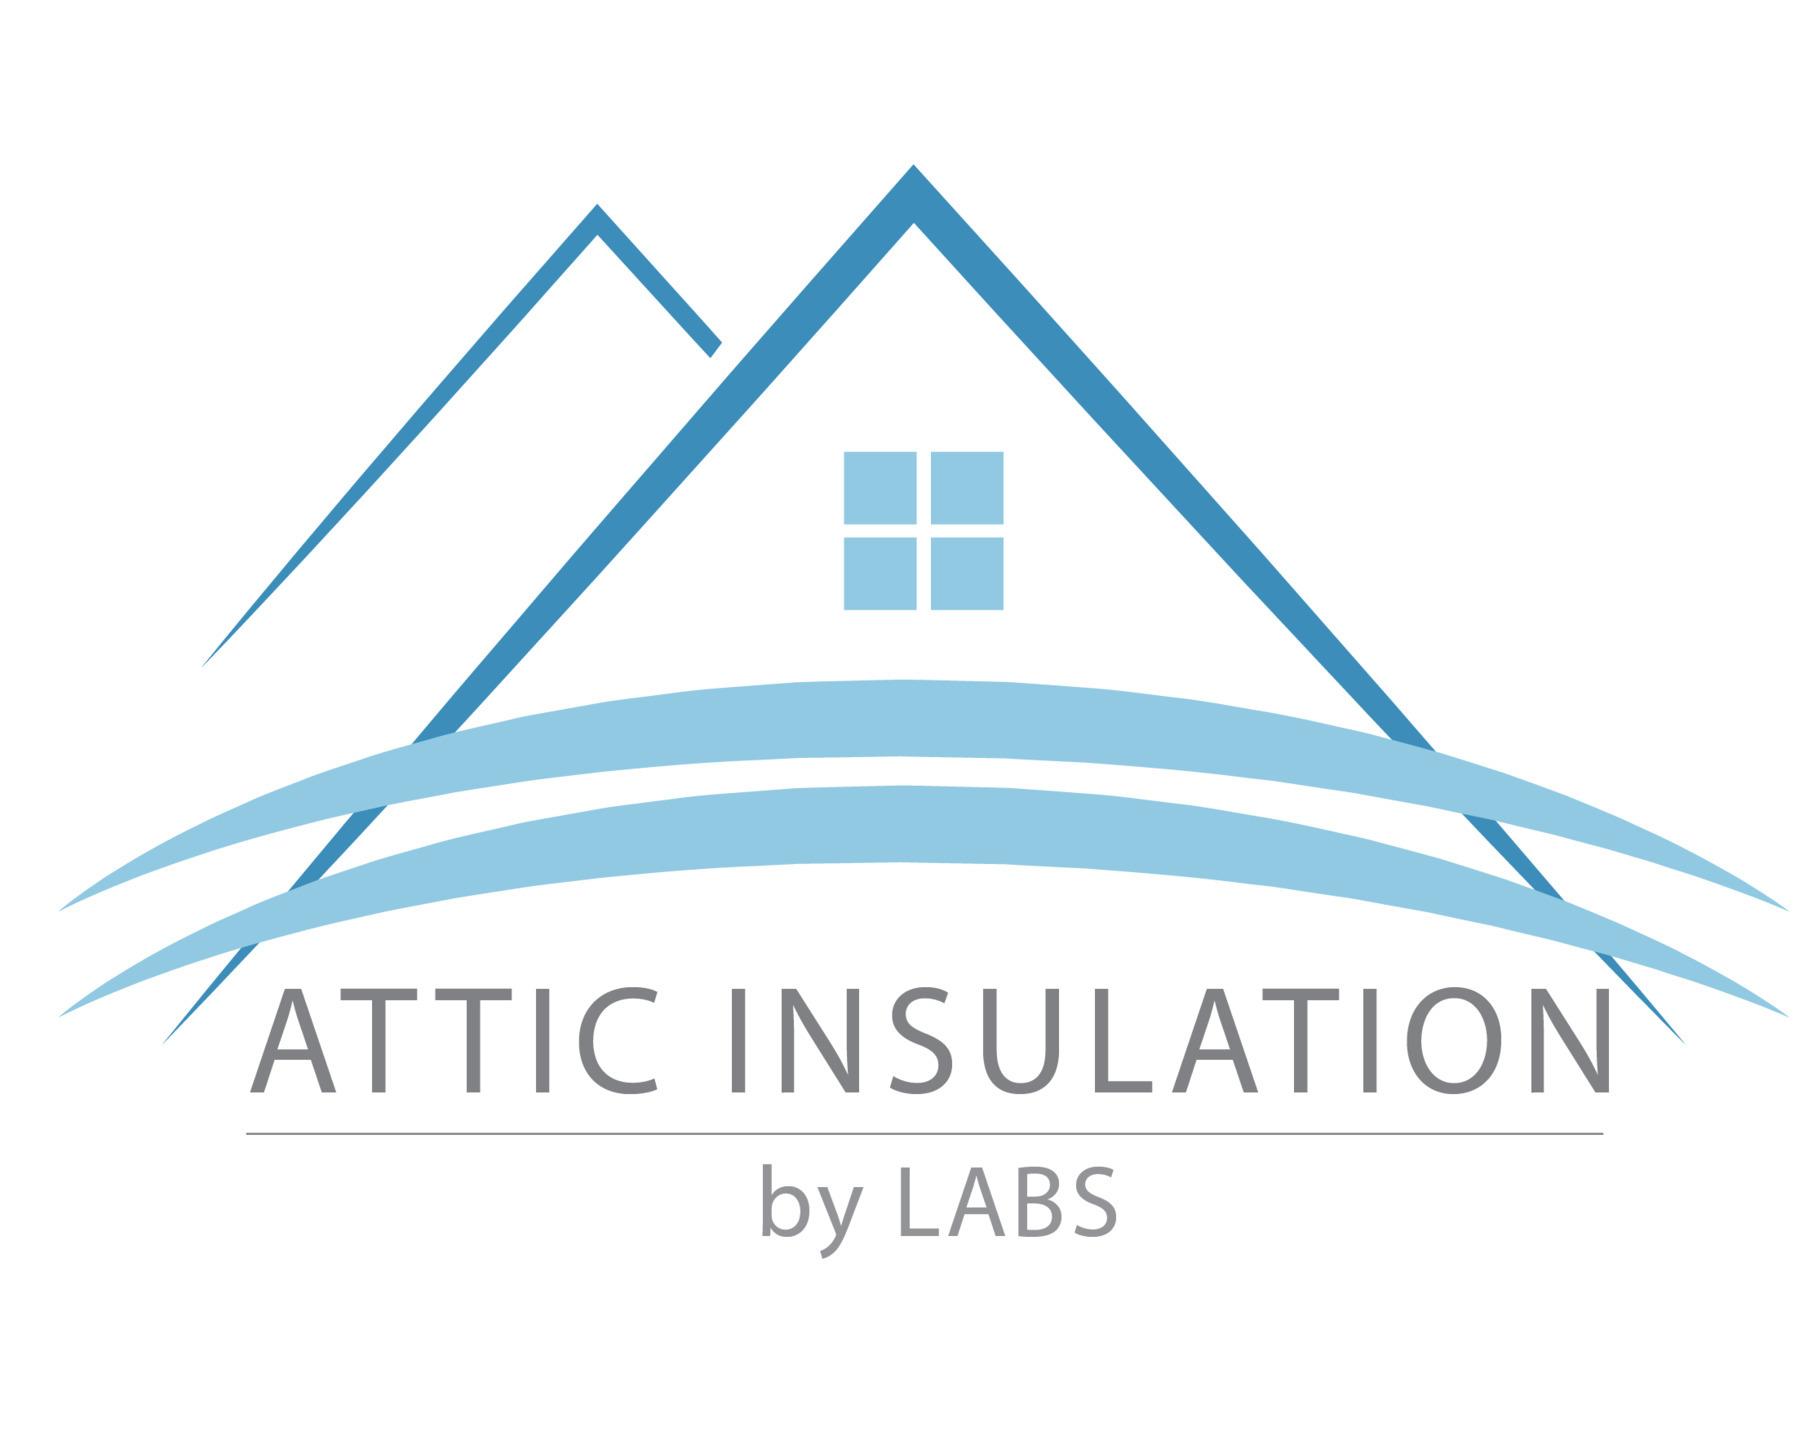 Attic Insulation by LABS (@atticinsulation) Cover Image